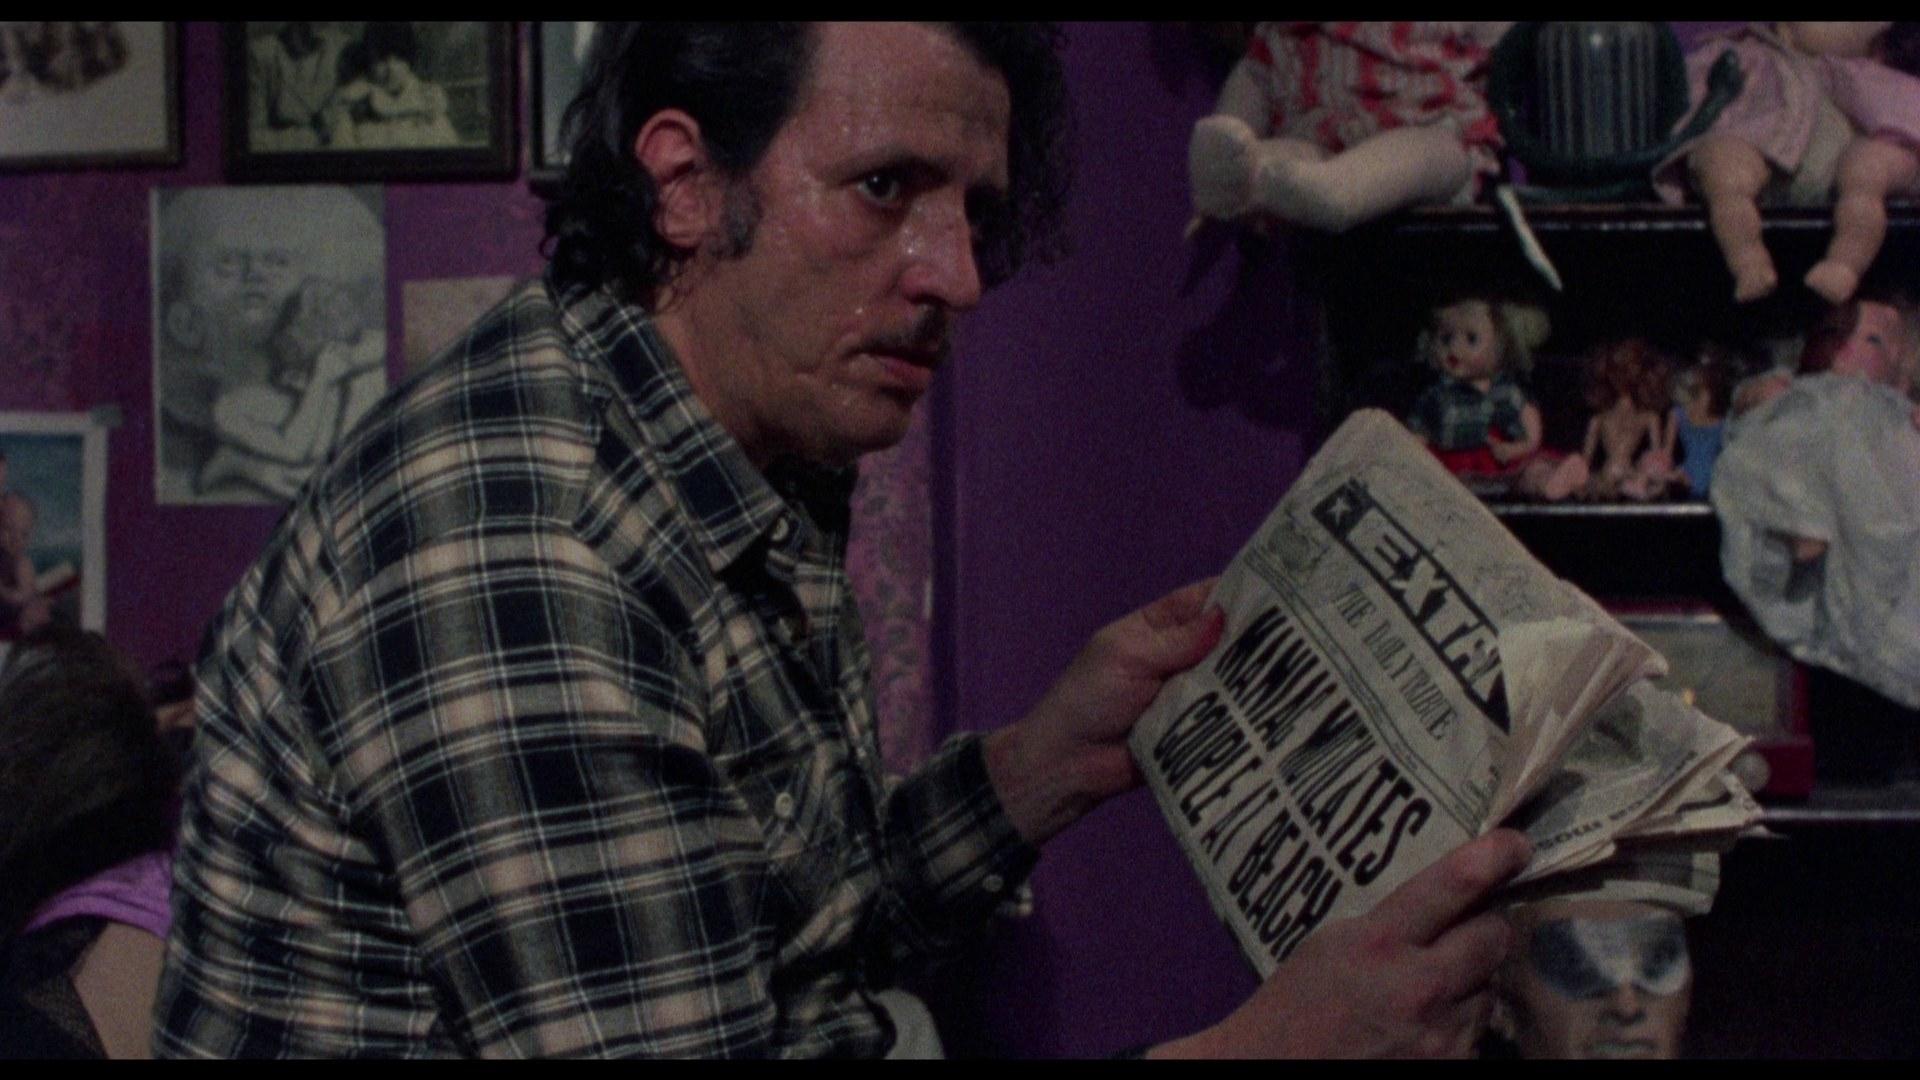 A creepy man reading a newspaper about horrific, murderous events